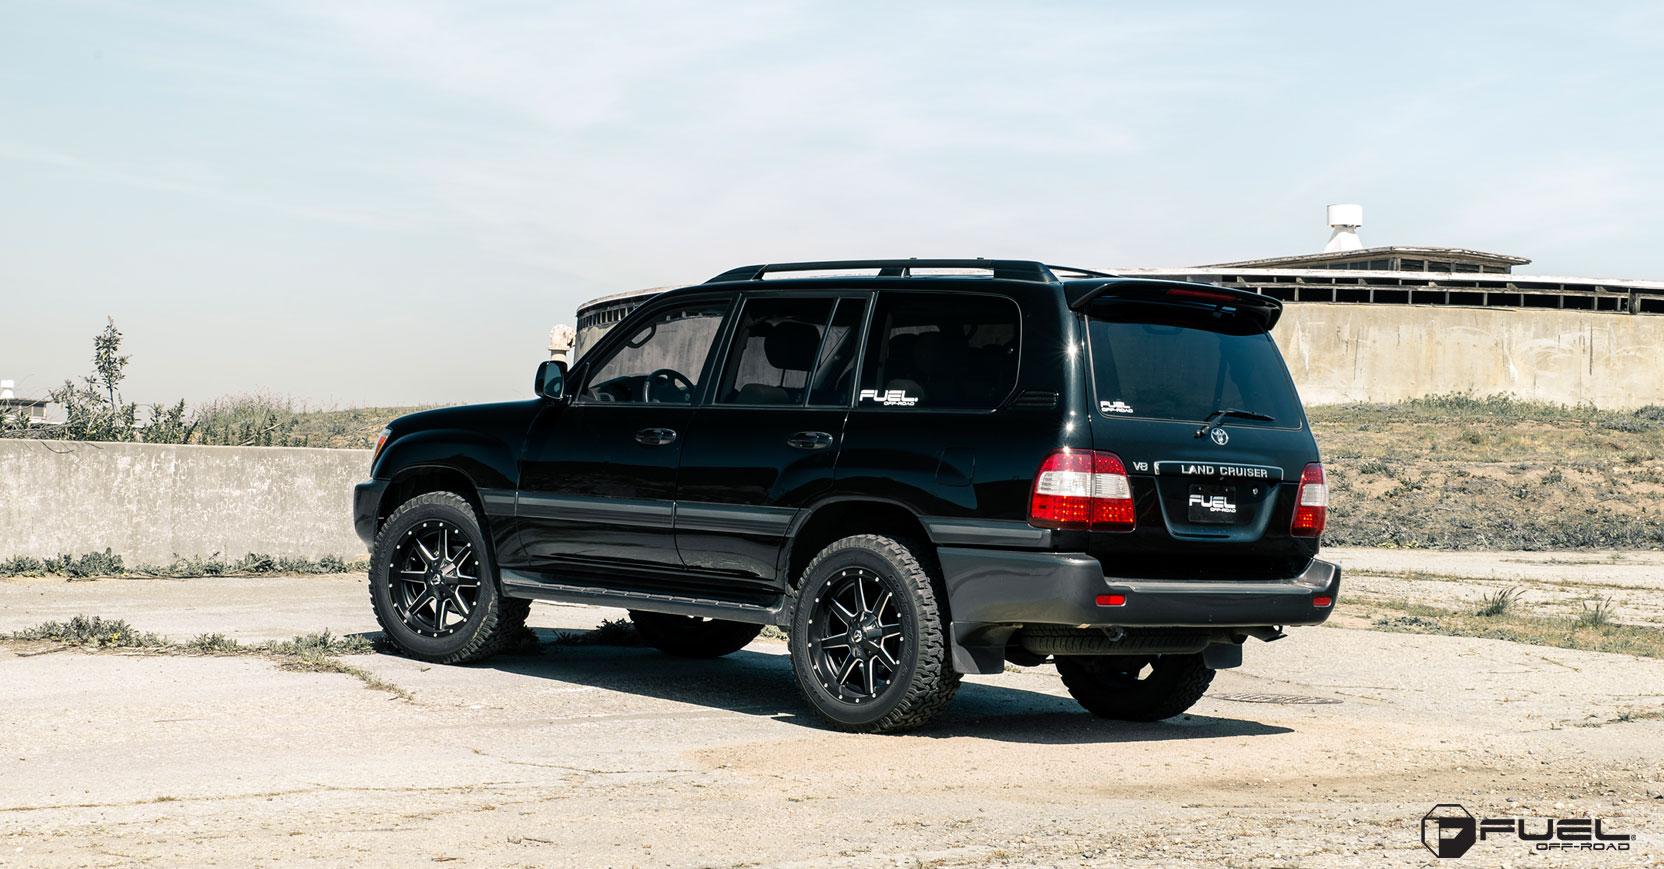 Toyota Land Cruiser Maverick - D538 Gallery - Fuel Off-Road Wheels